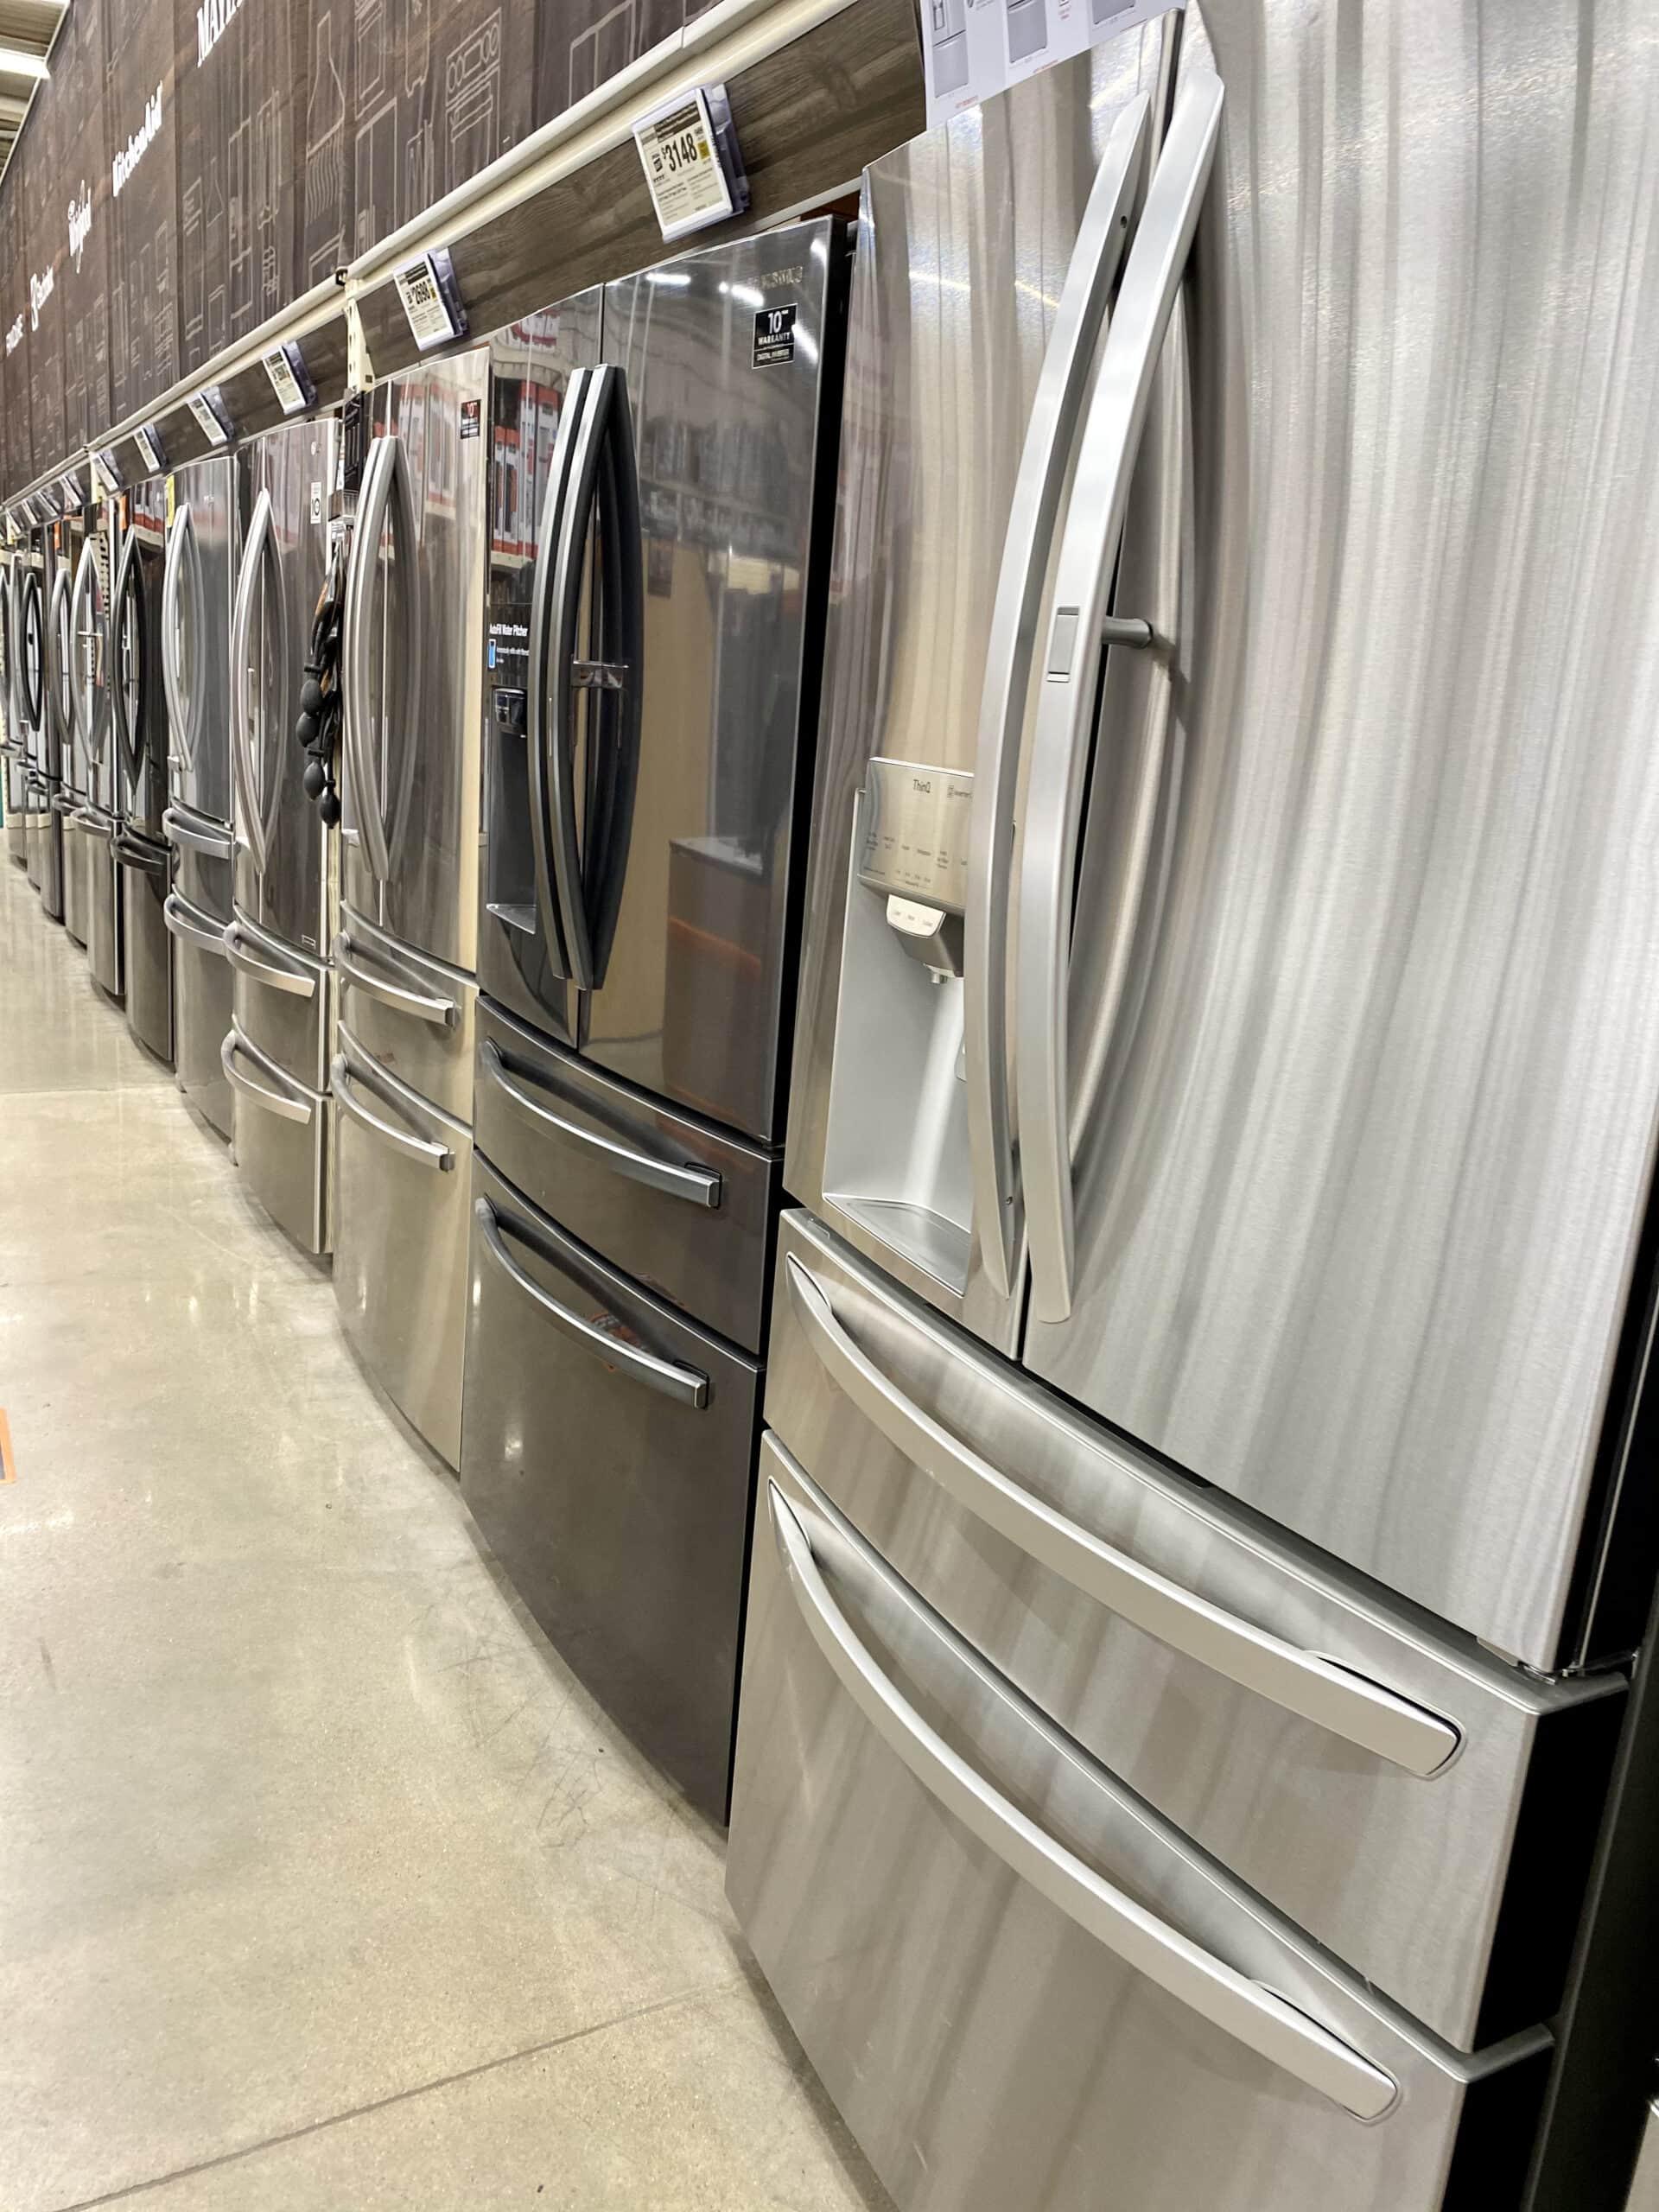 refrigerators - scratch and dent appliances